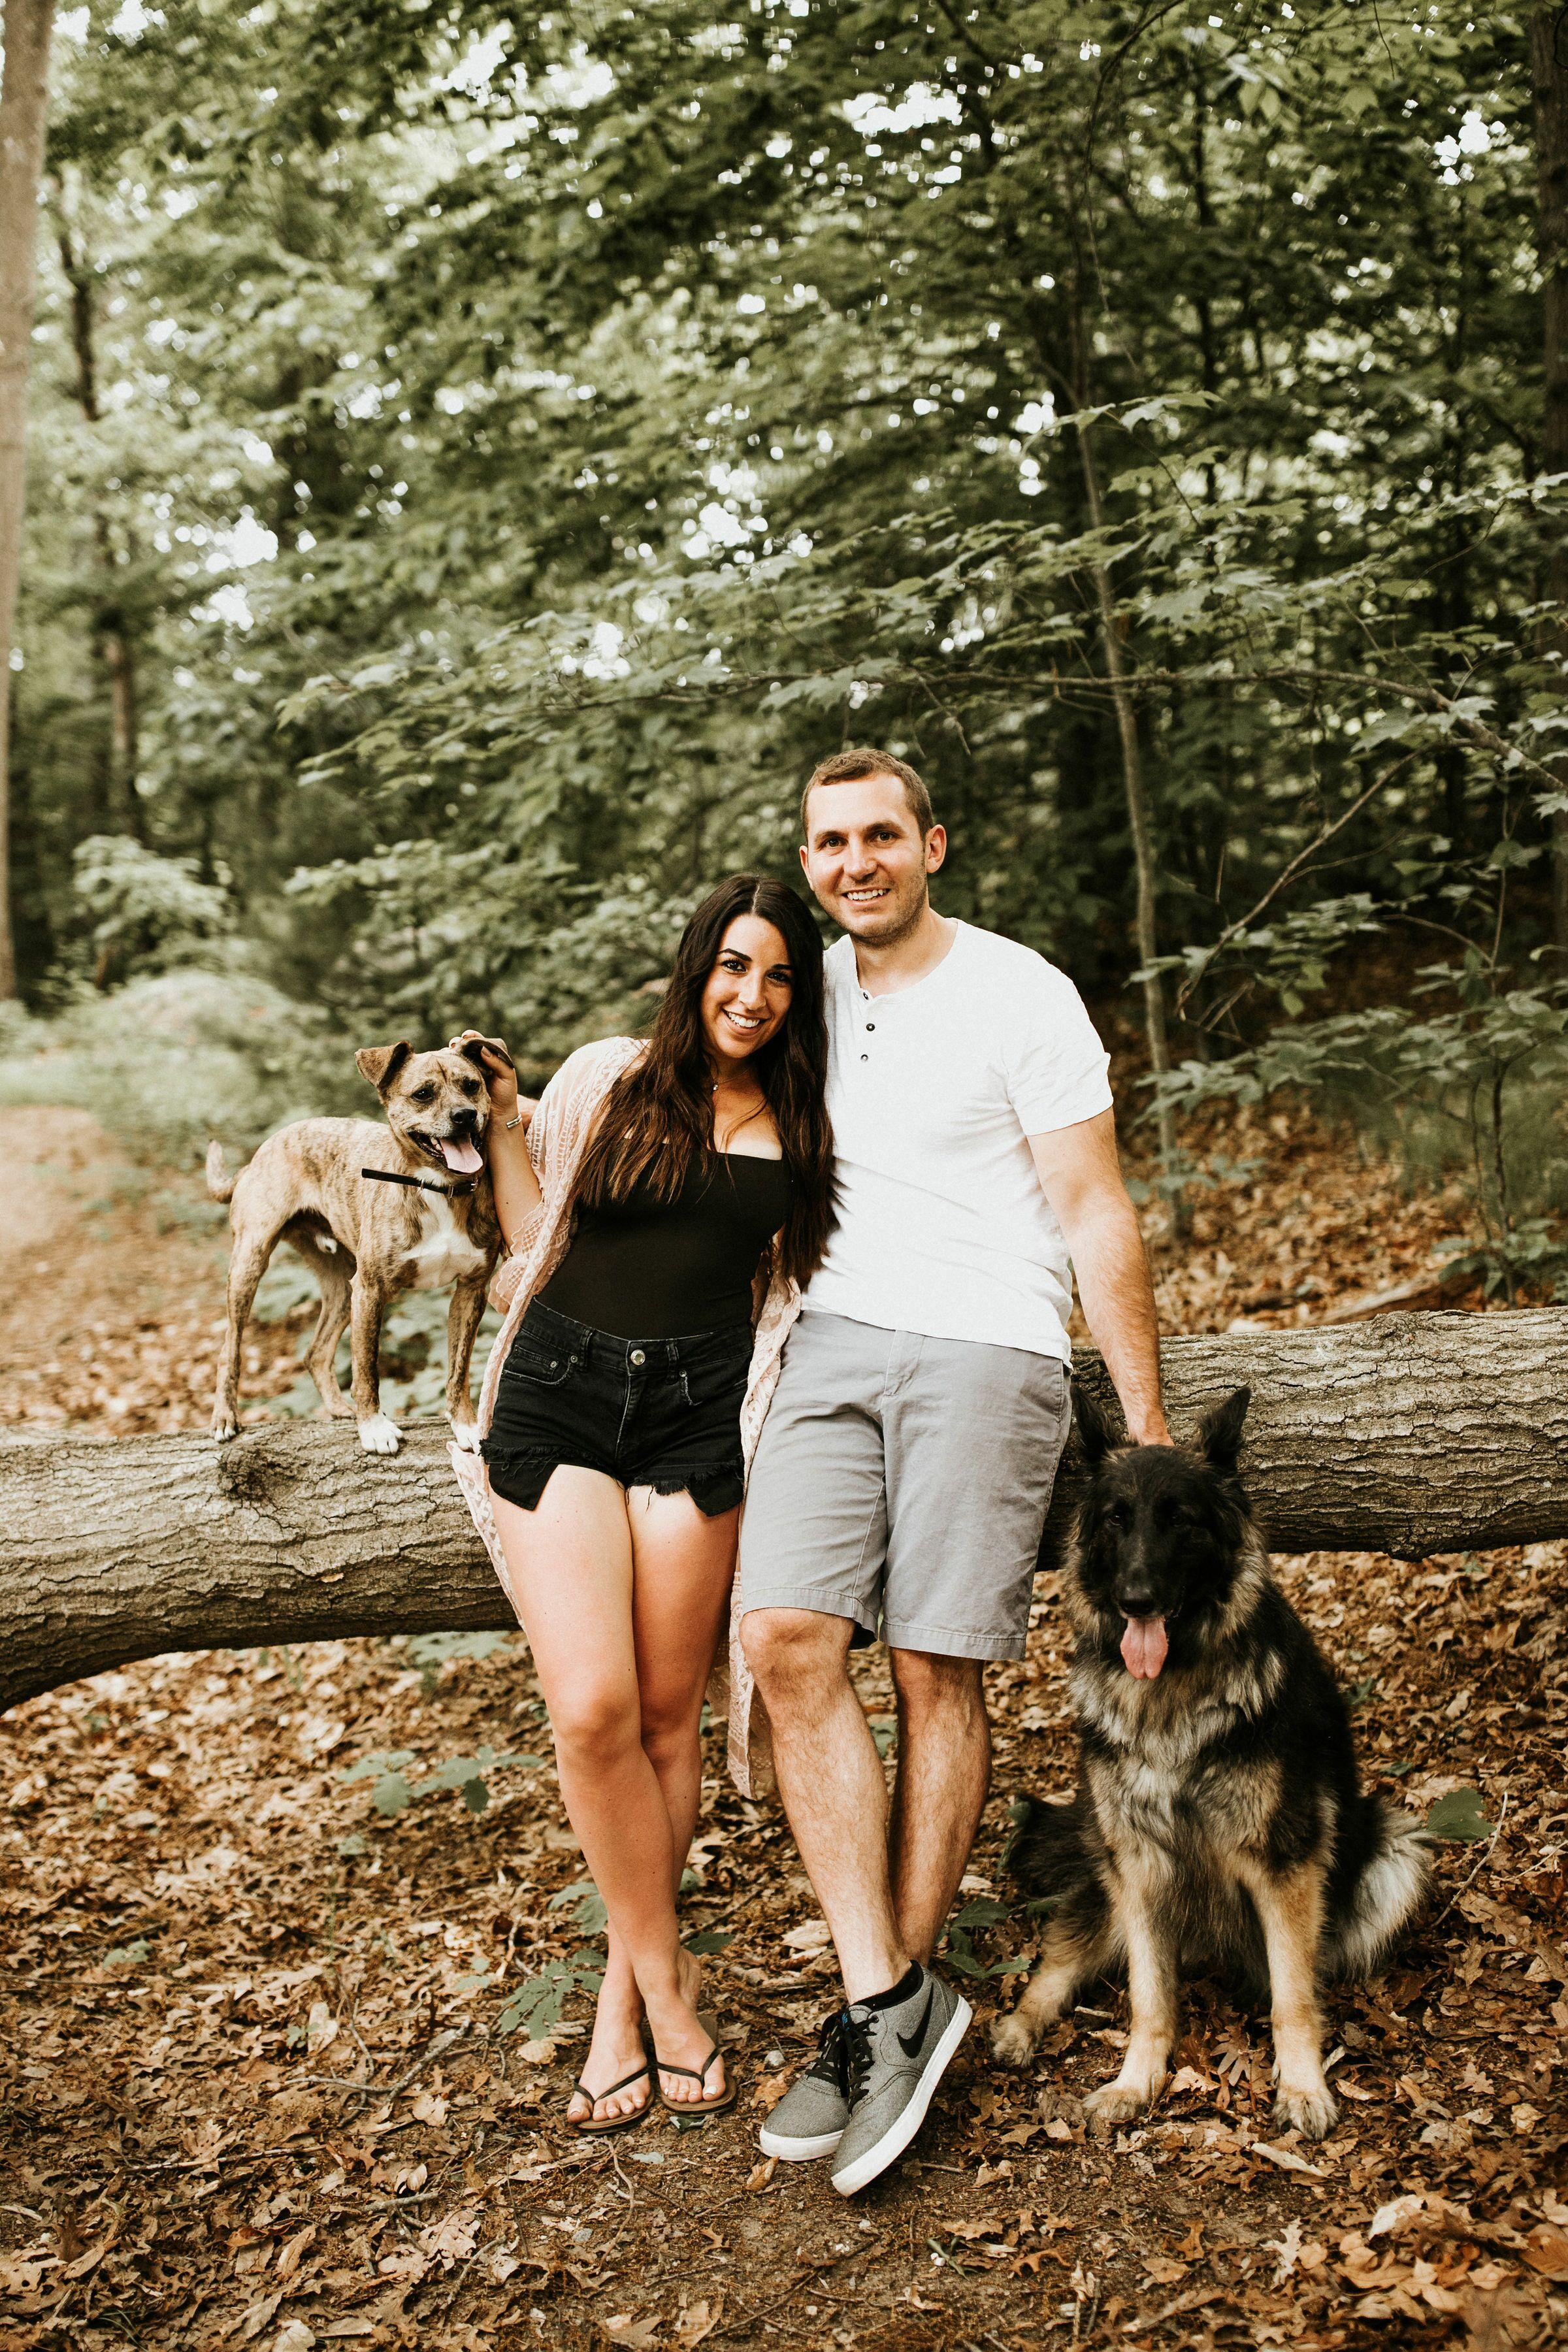 Image 1 of Alicia and Dan